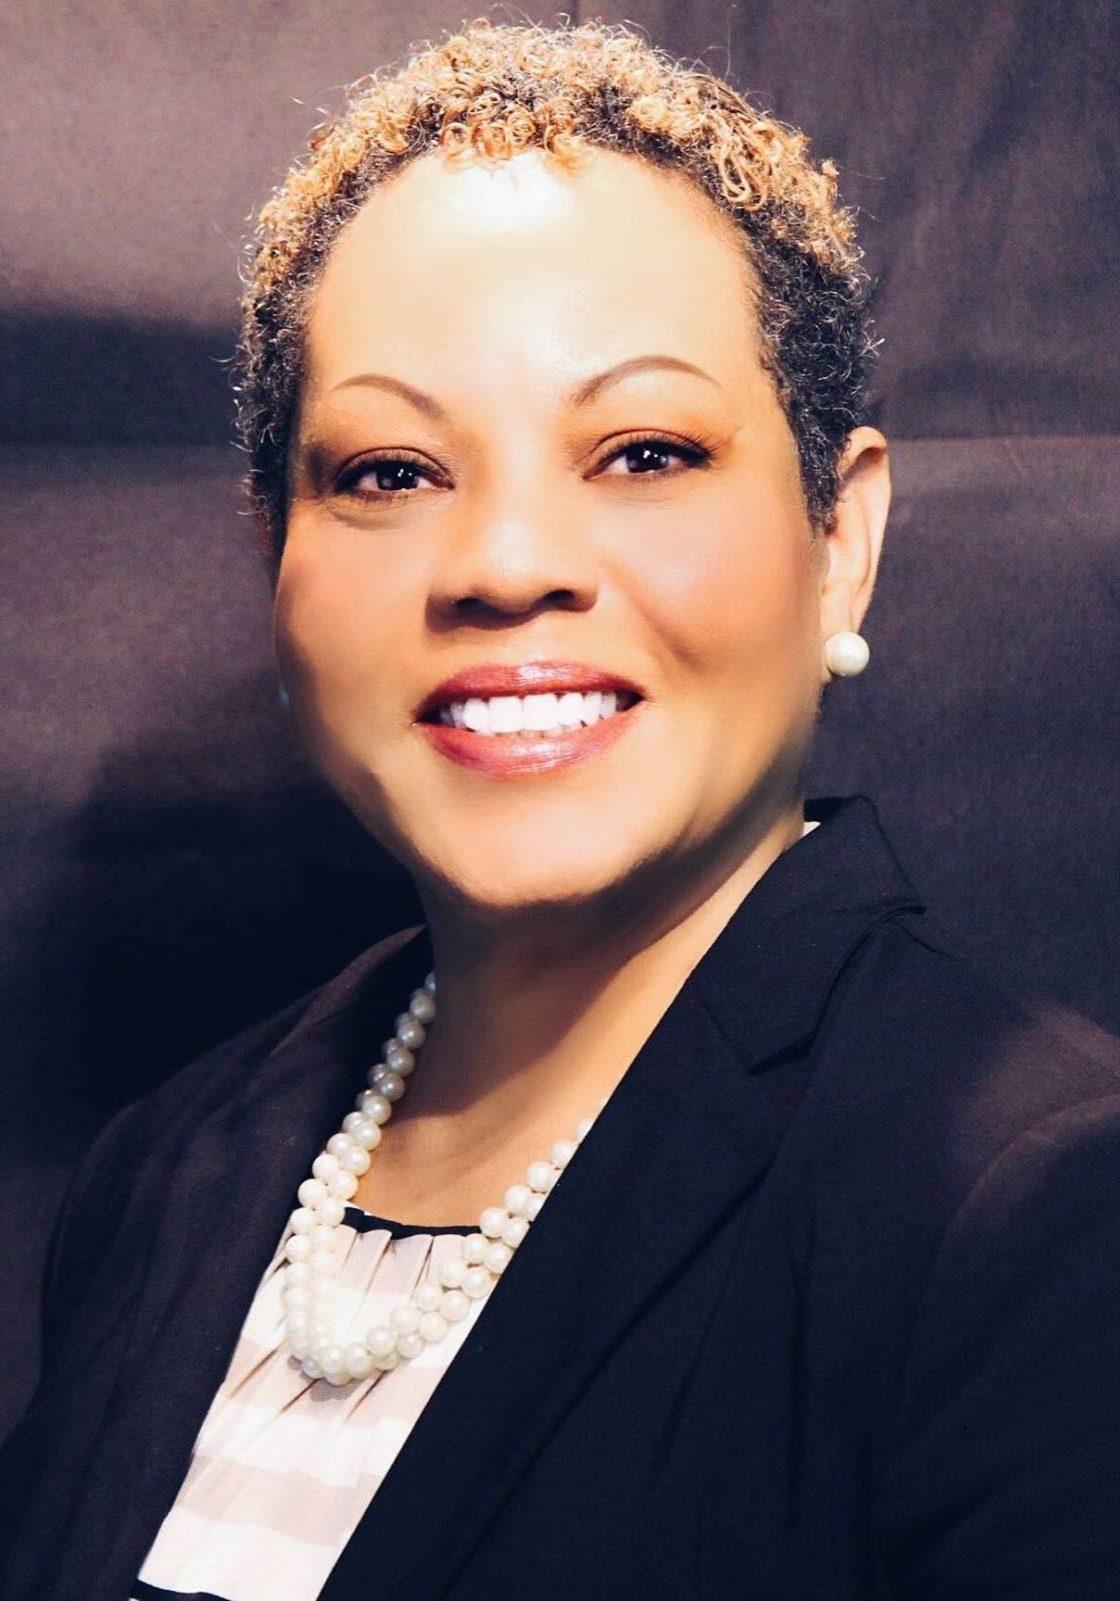 Rosalyn Henderson Myers, Willoughby Avenue, The Five Fifths, KOLUMN Magazine, KOLUMN, African American Politics, Black in Politics